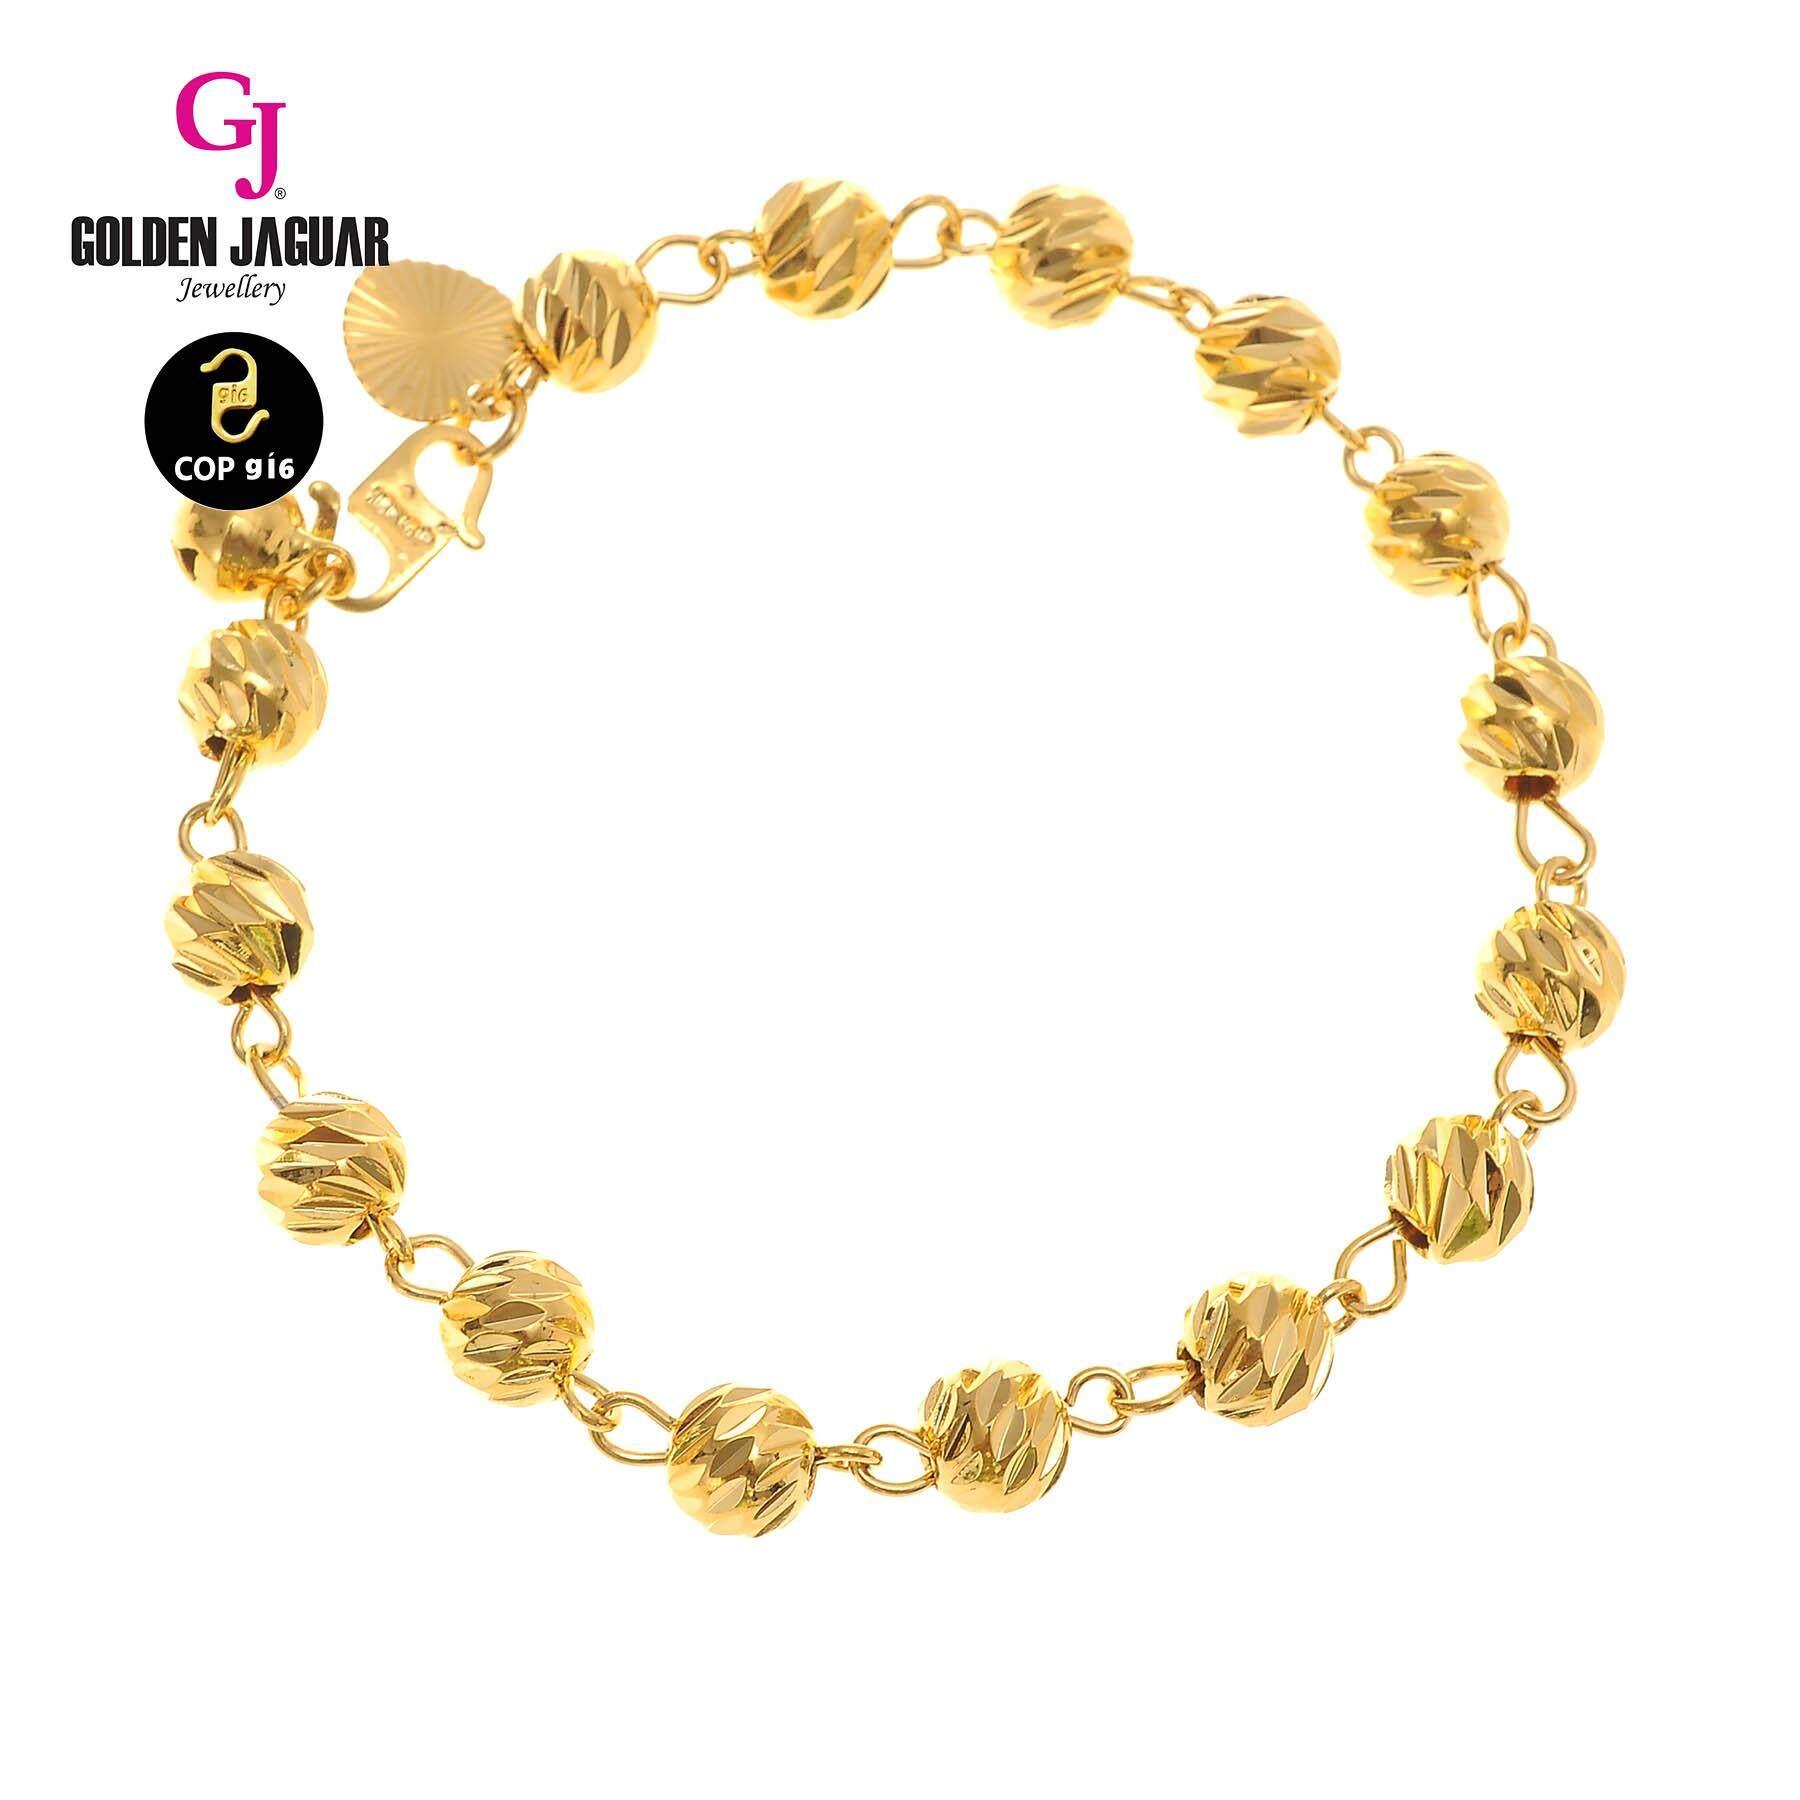 GJ Jewellery Emas Korea Bracelet - Bulan Sabit 9  4.0 (2260403)/Gold Plated